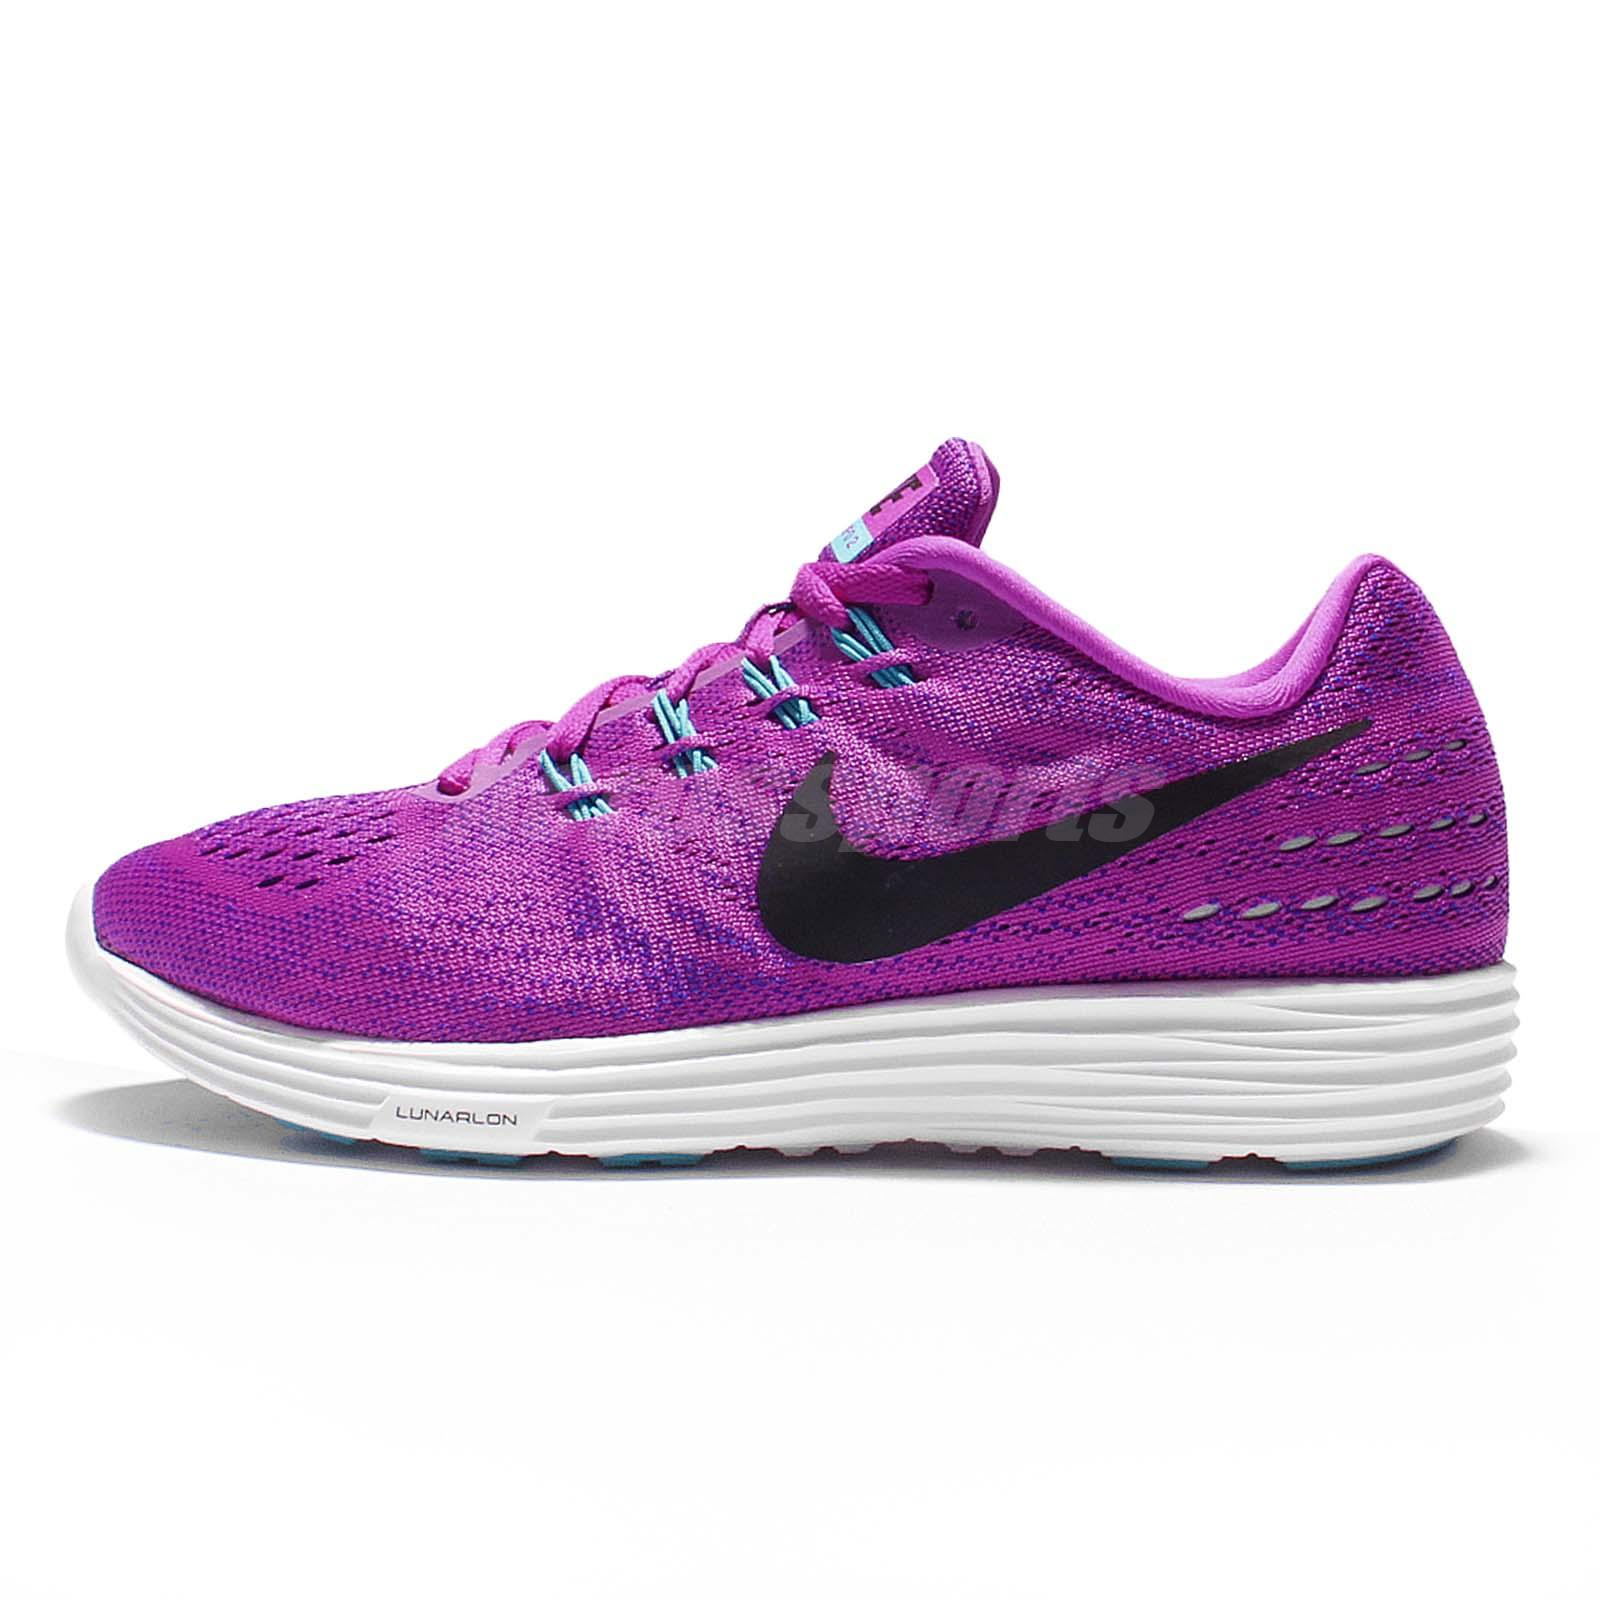 Nike Wmns Nike Lunartempo 2 Violet FJeaVBR